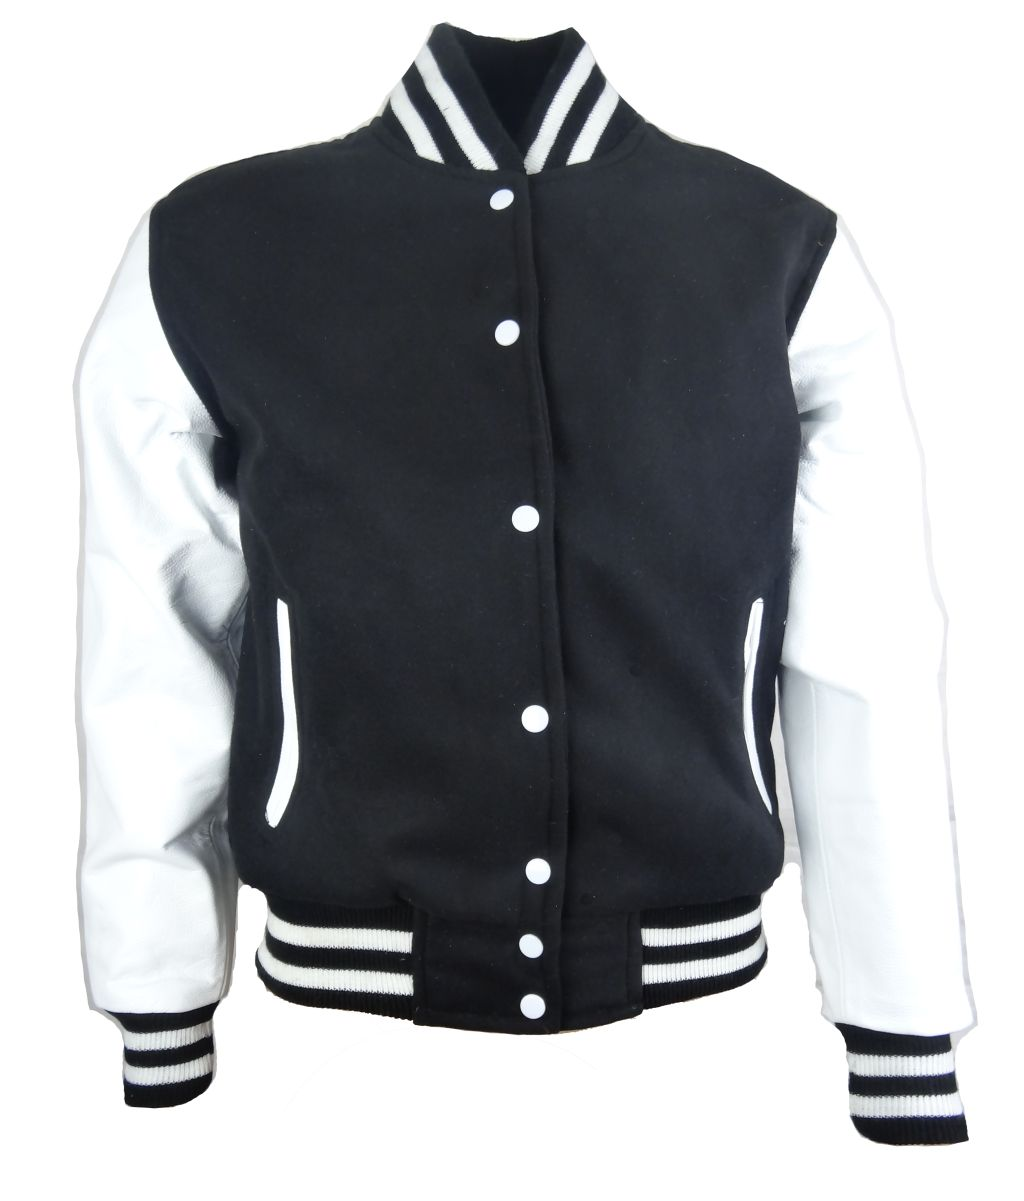 Herren College Baseball Jacke Sweat Jacke Lederarme Schwarz-Weiß S - 6 XL